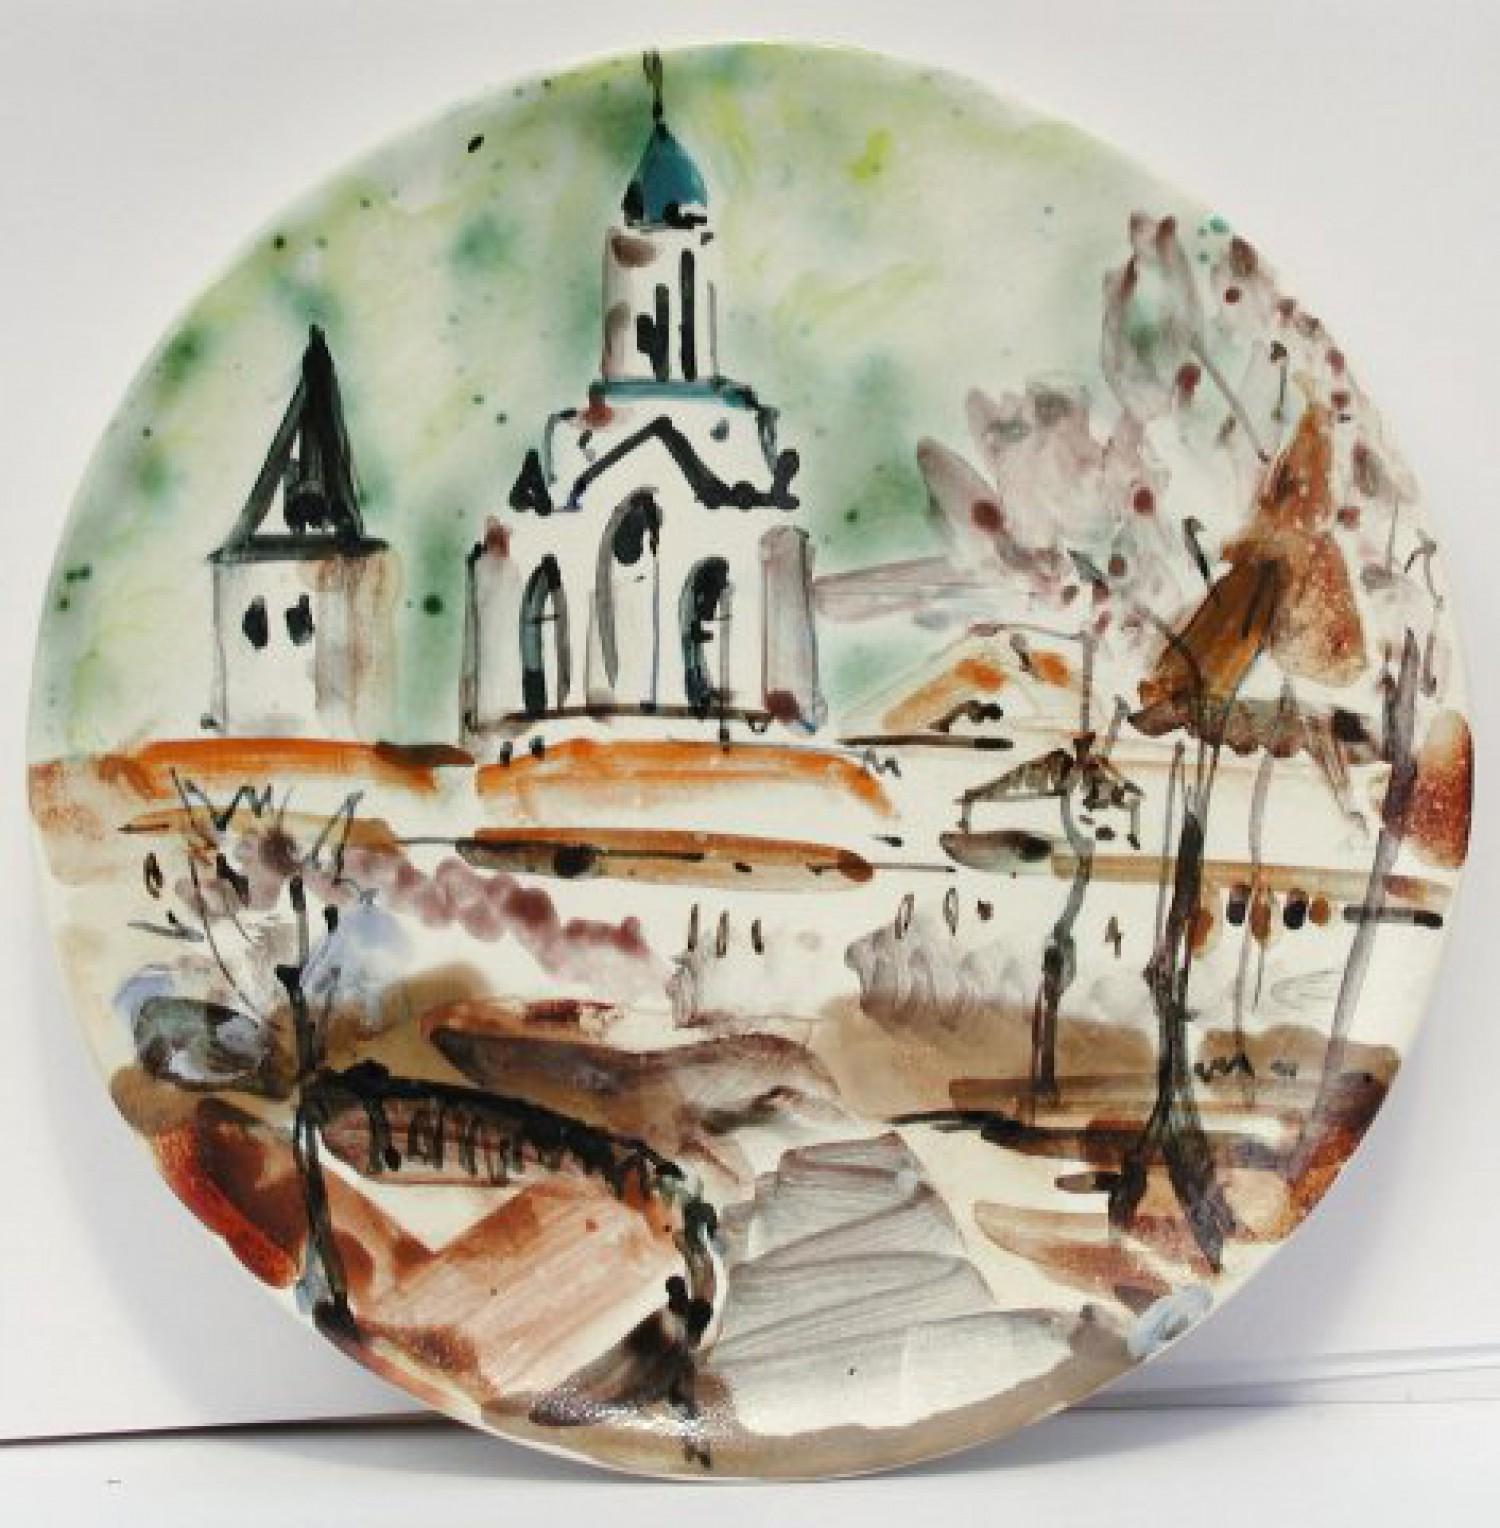 "Н.Н.Мухина. Тарелка из серии ""Ярославские мотивы». Фаянс, ангобы, соли. d 20 см. 2010 г."